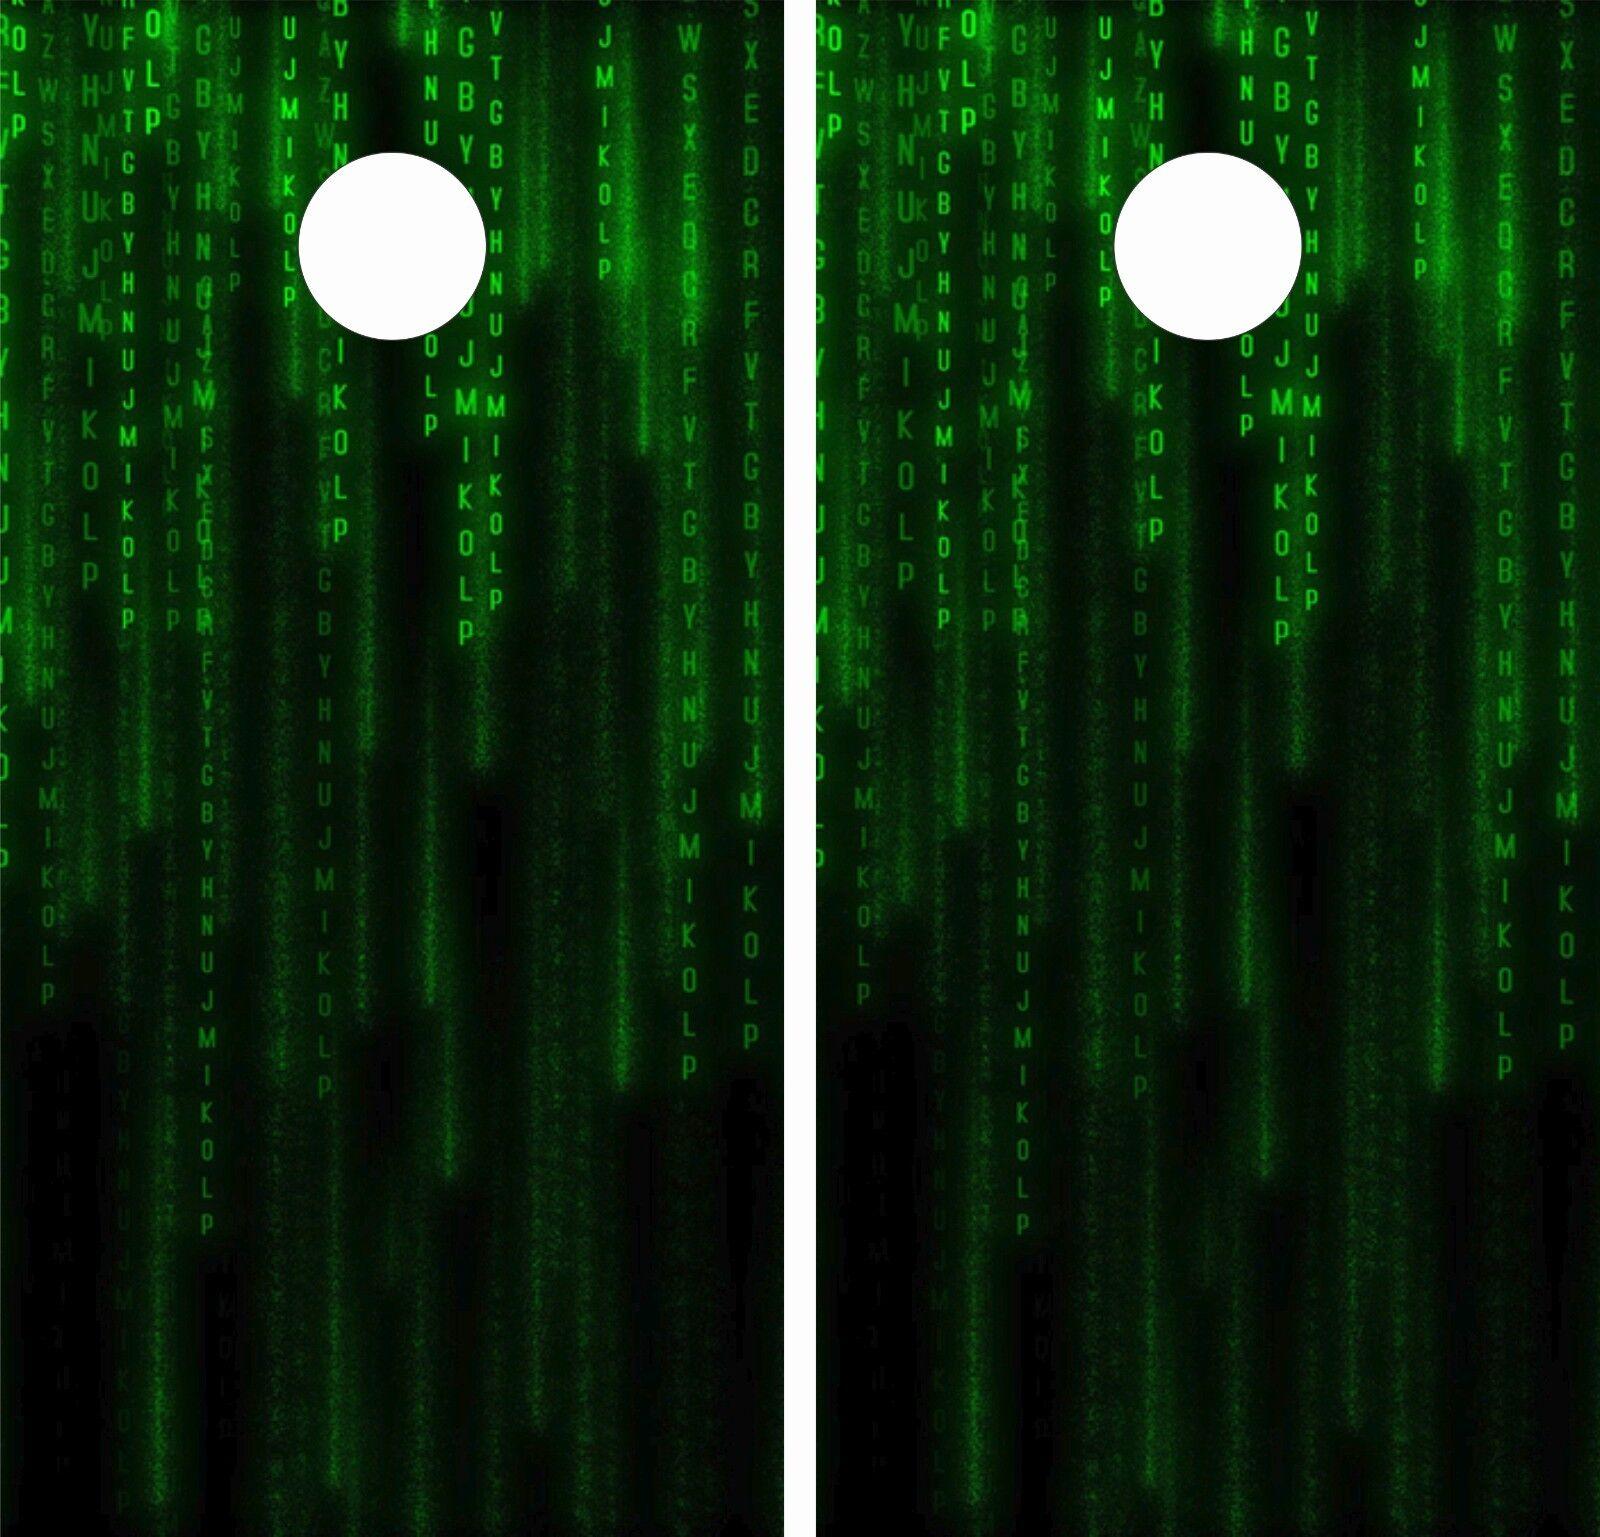 Matrix ReloadedCornhole Board  Game Decal Wraps USA High Quality Image  LAMINATED  trendy